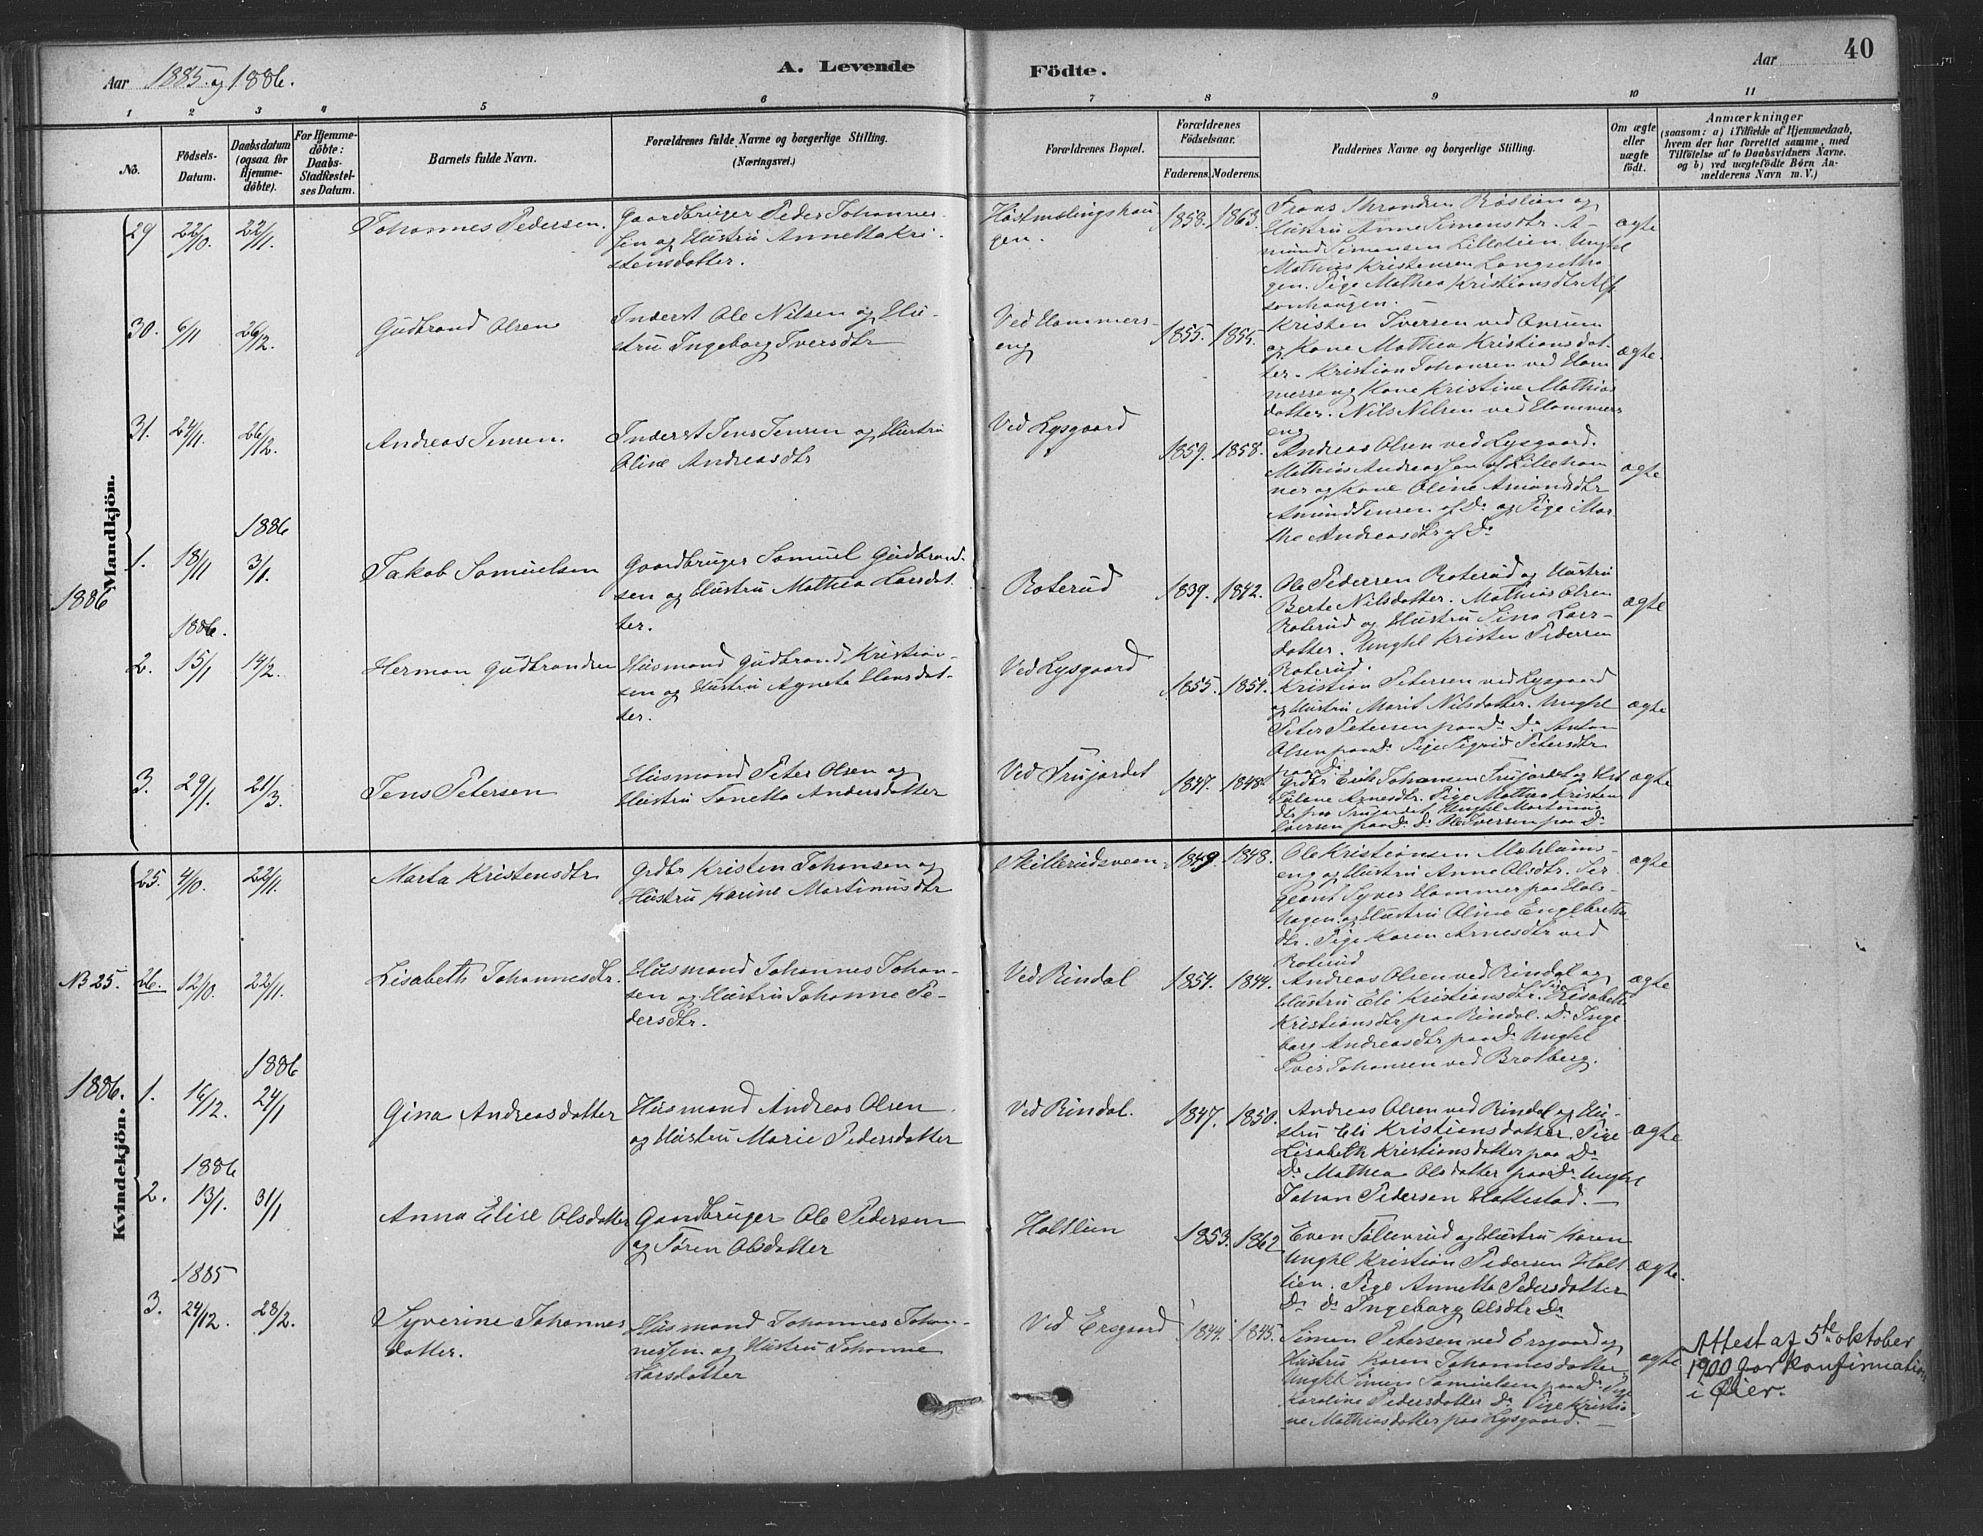 SAH, Fåberg prestekontor, Ministerialbok nr. 9, 1879-1898, s. 40